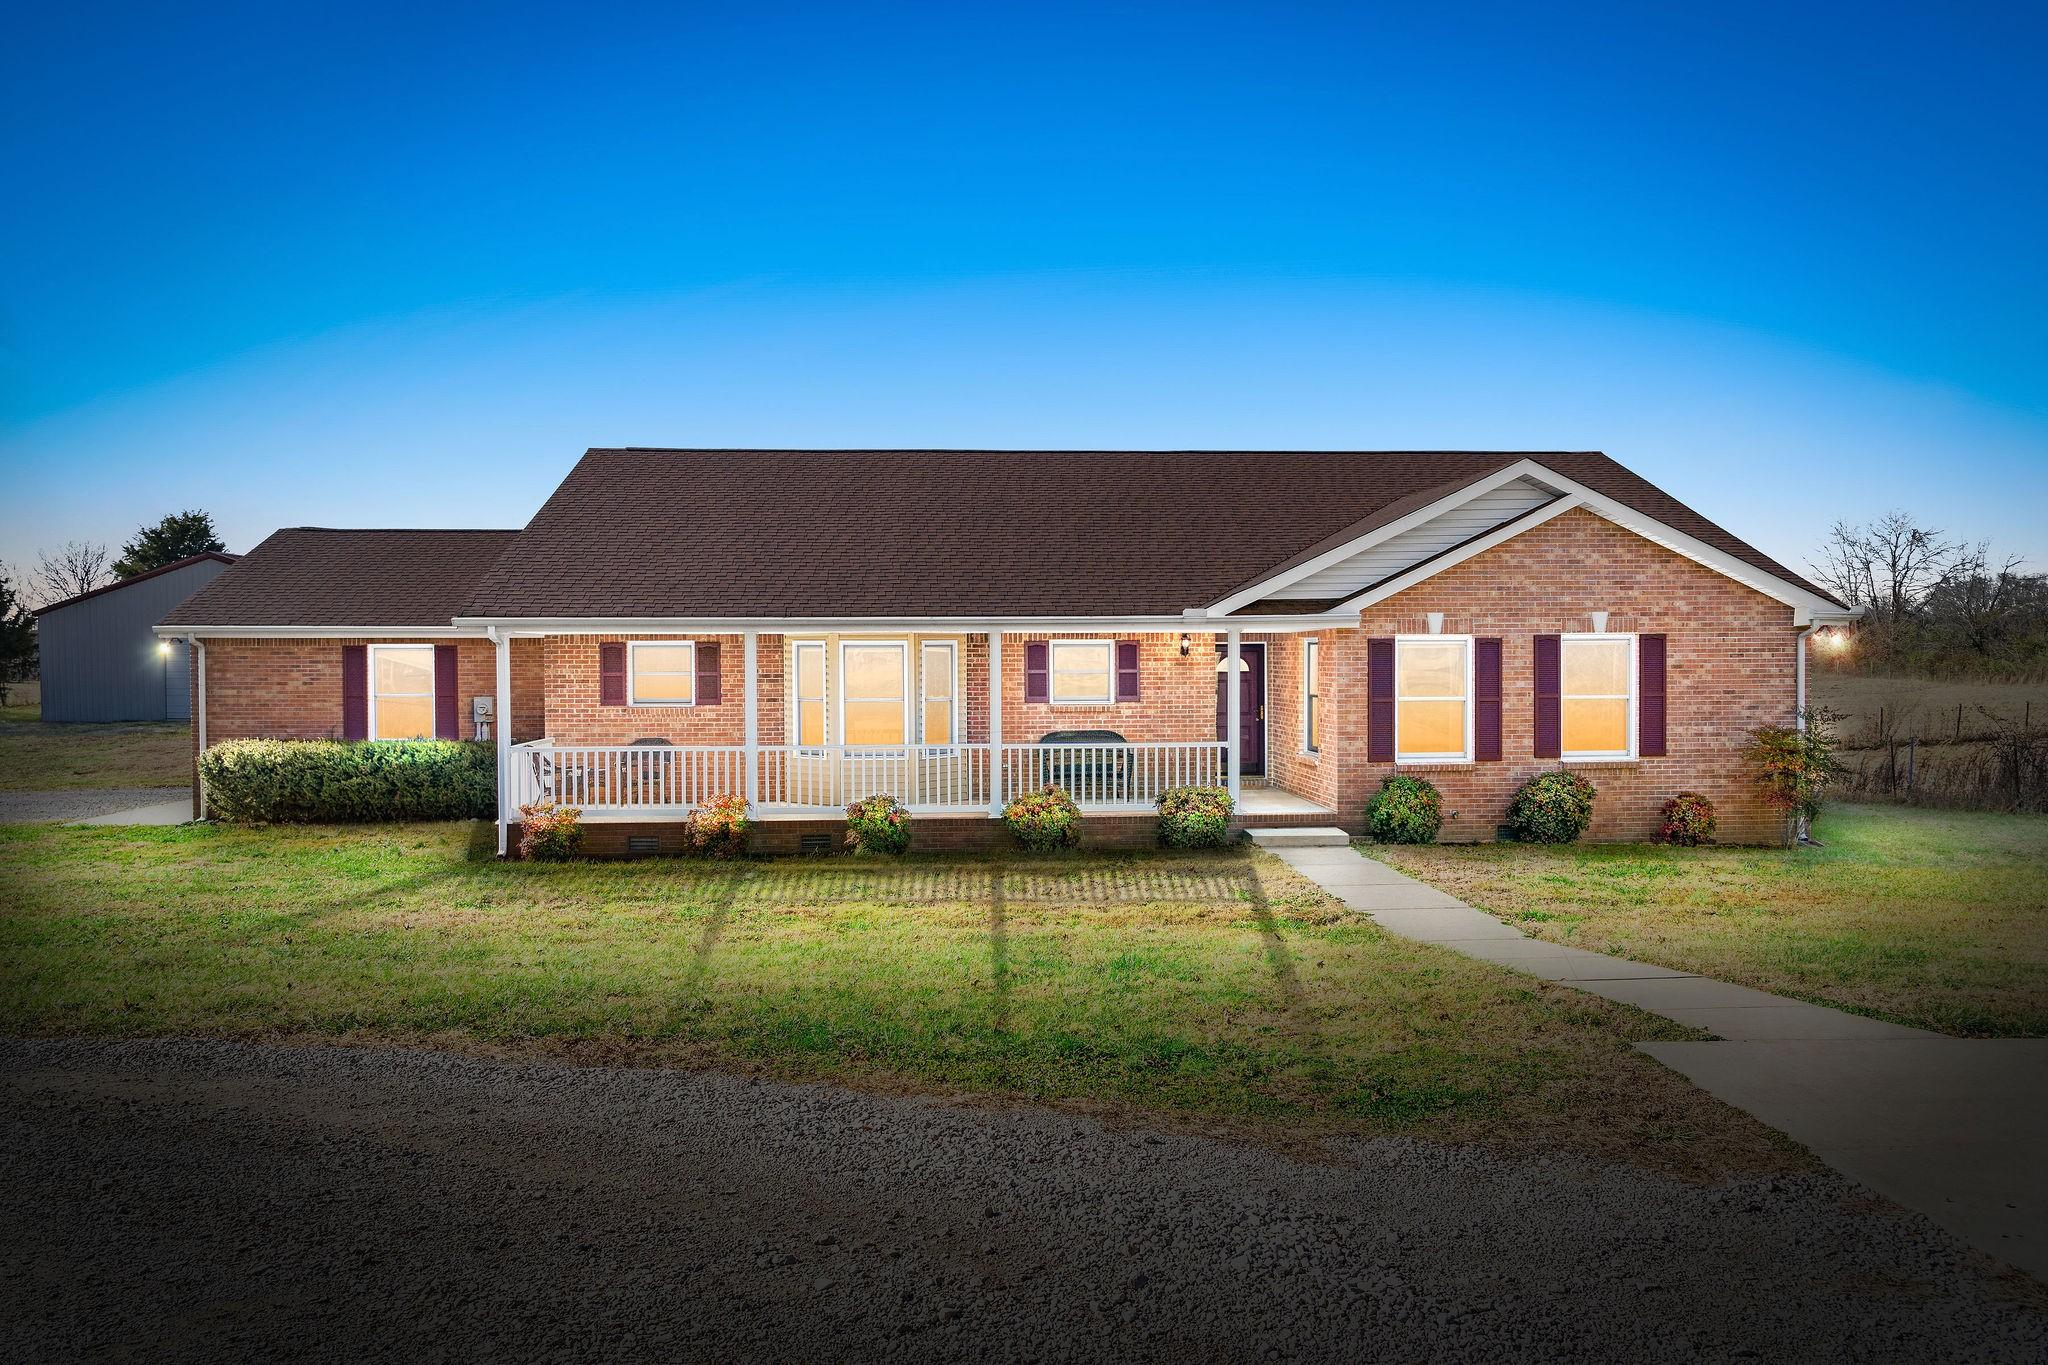 2748 Lylewood Rd Property Photo - Woodlawn, TN real estate listing